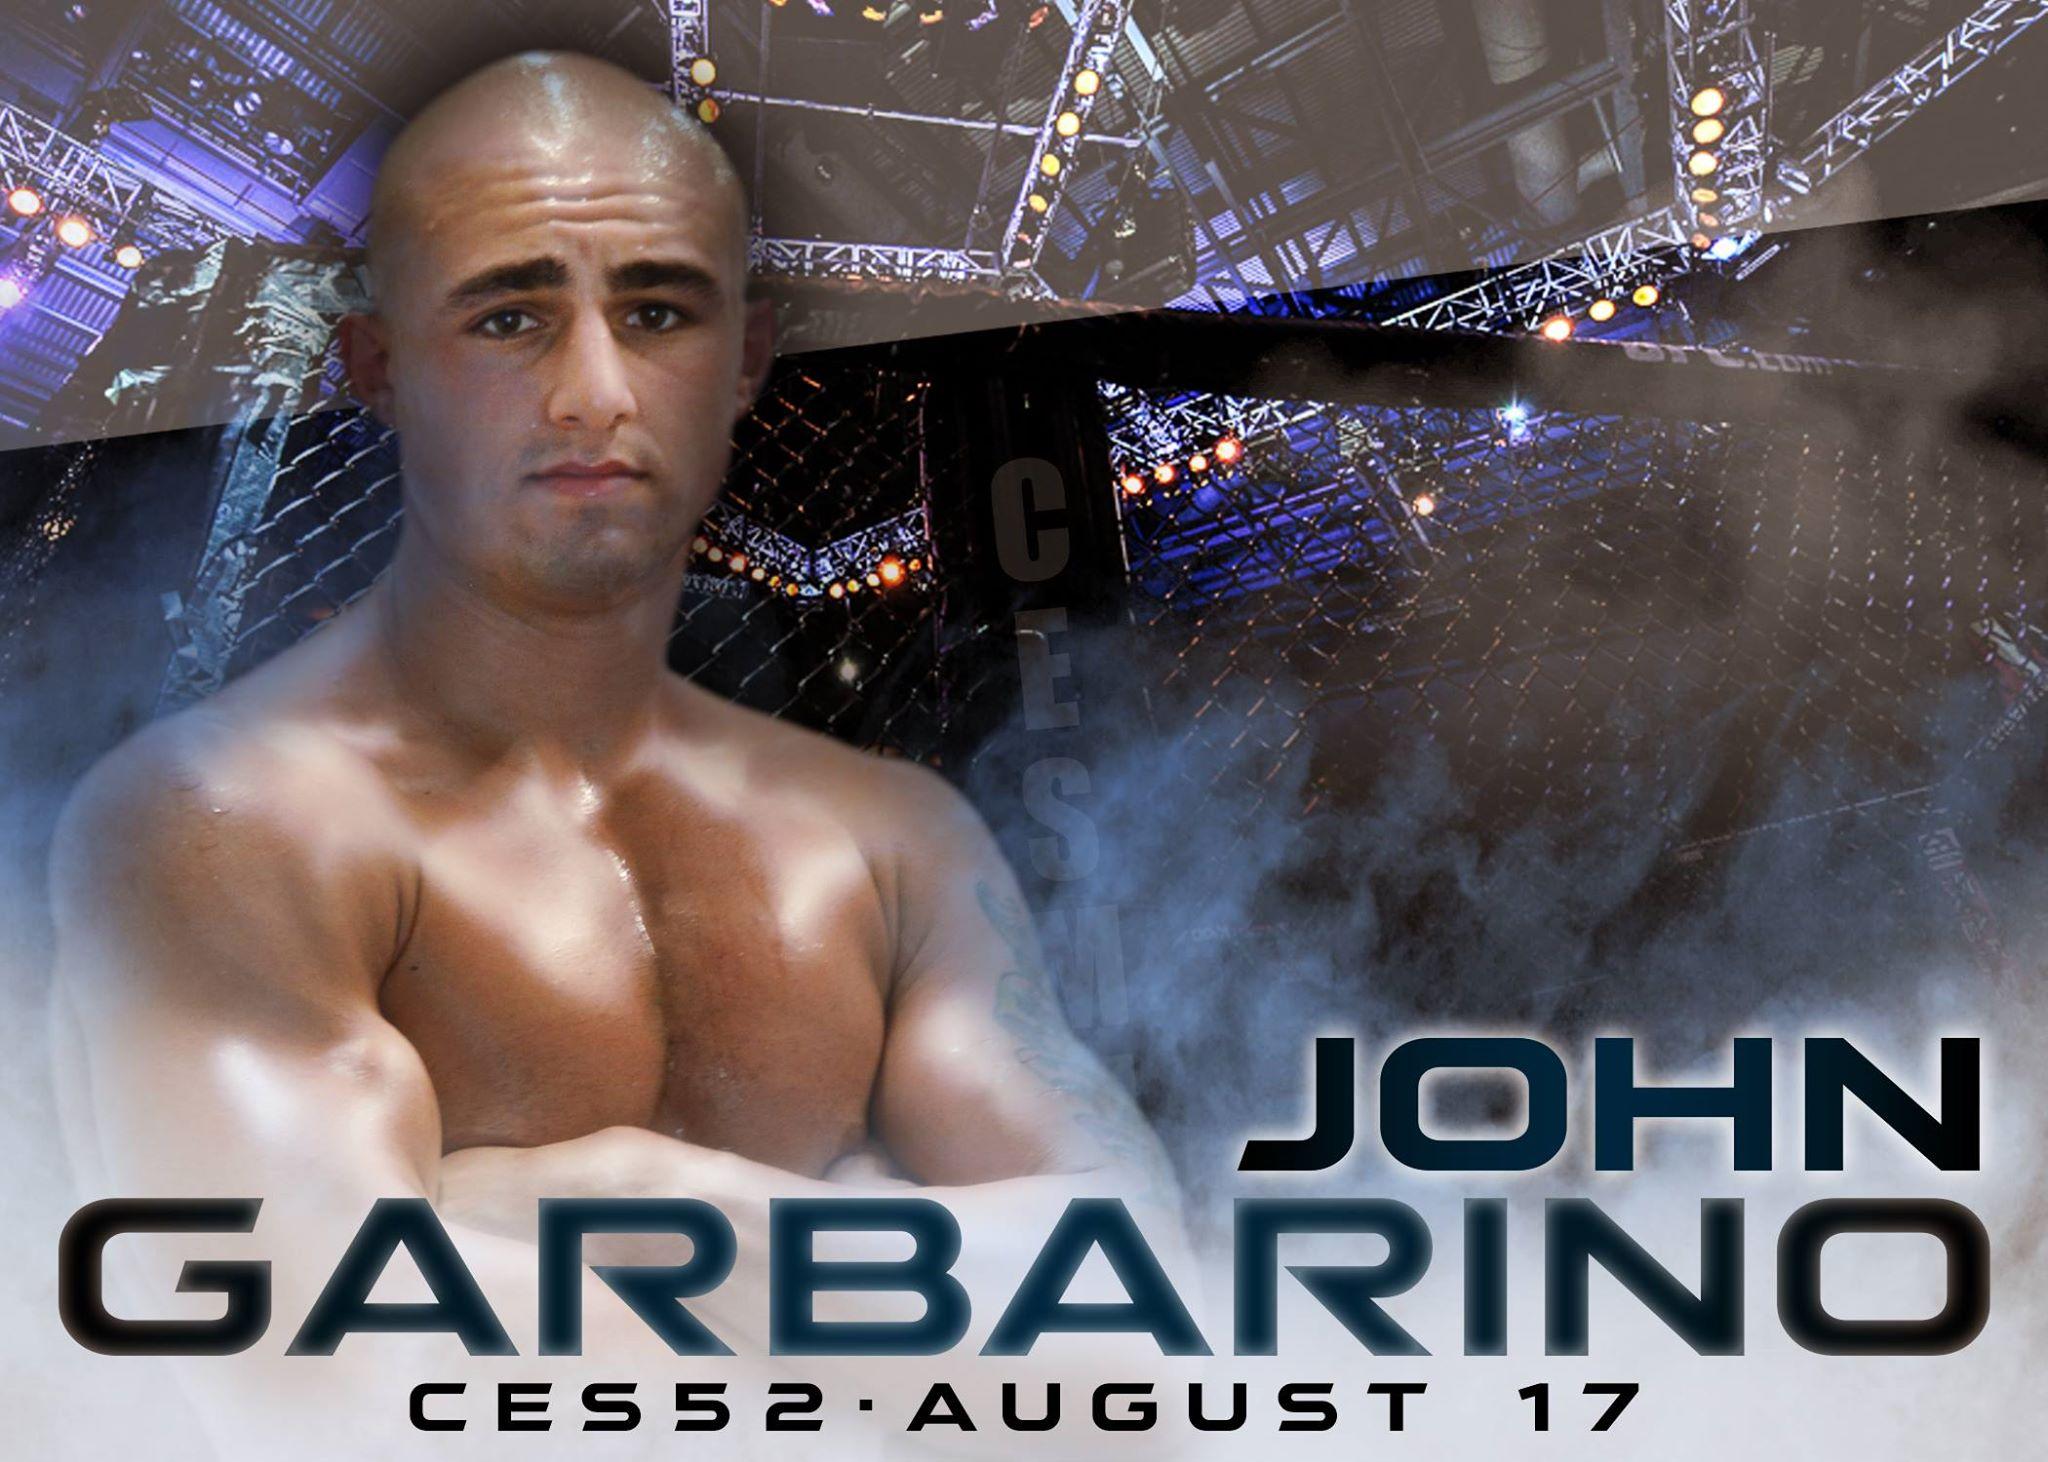 John Garbarino